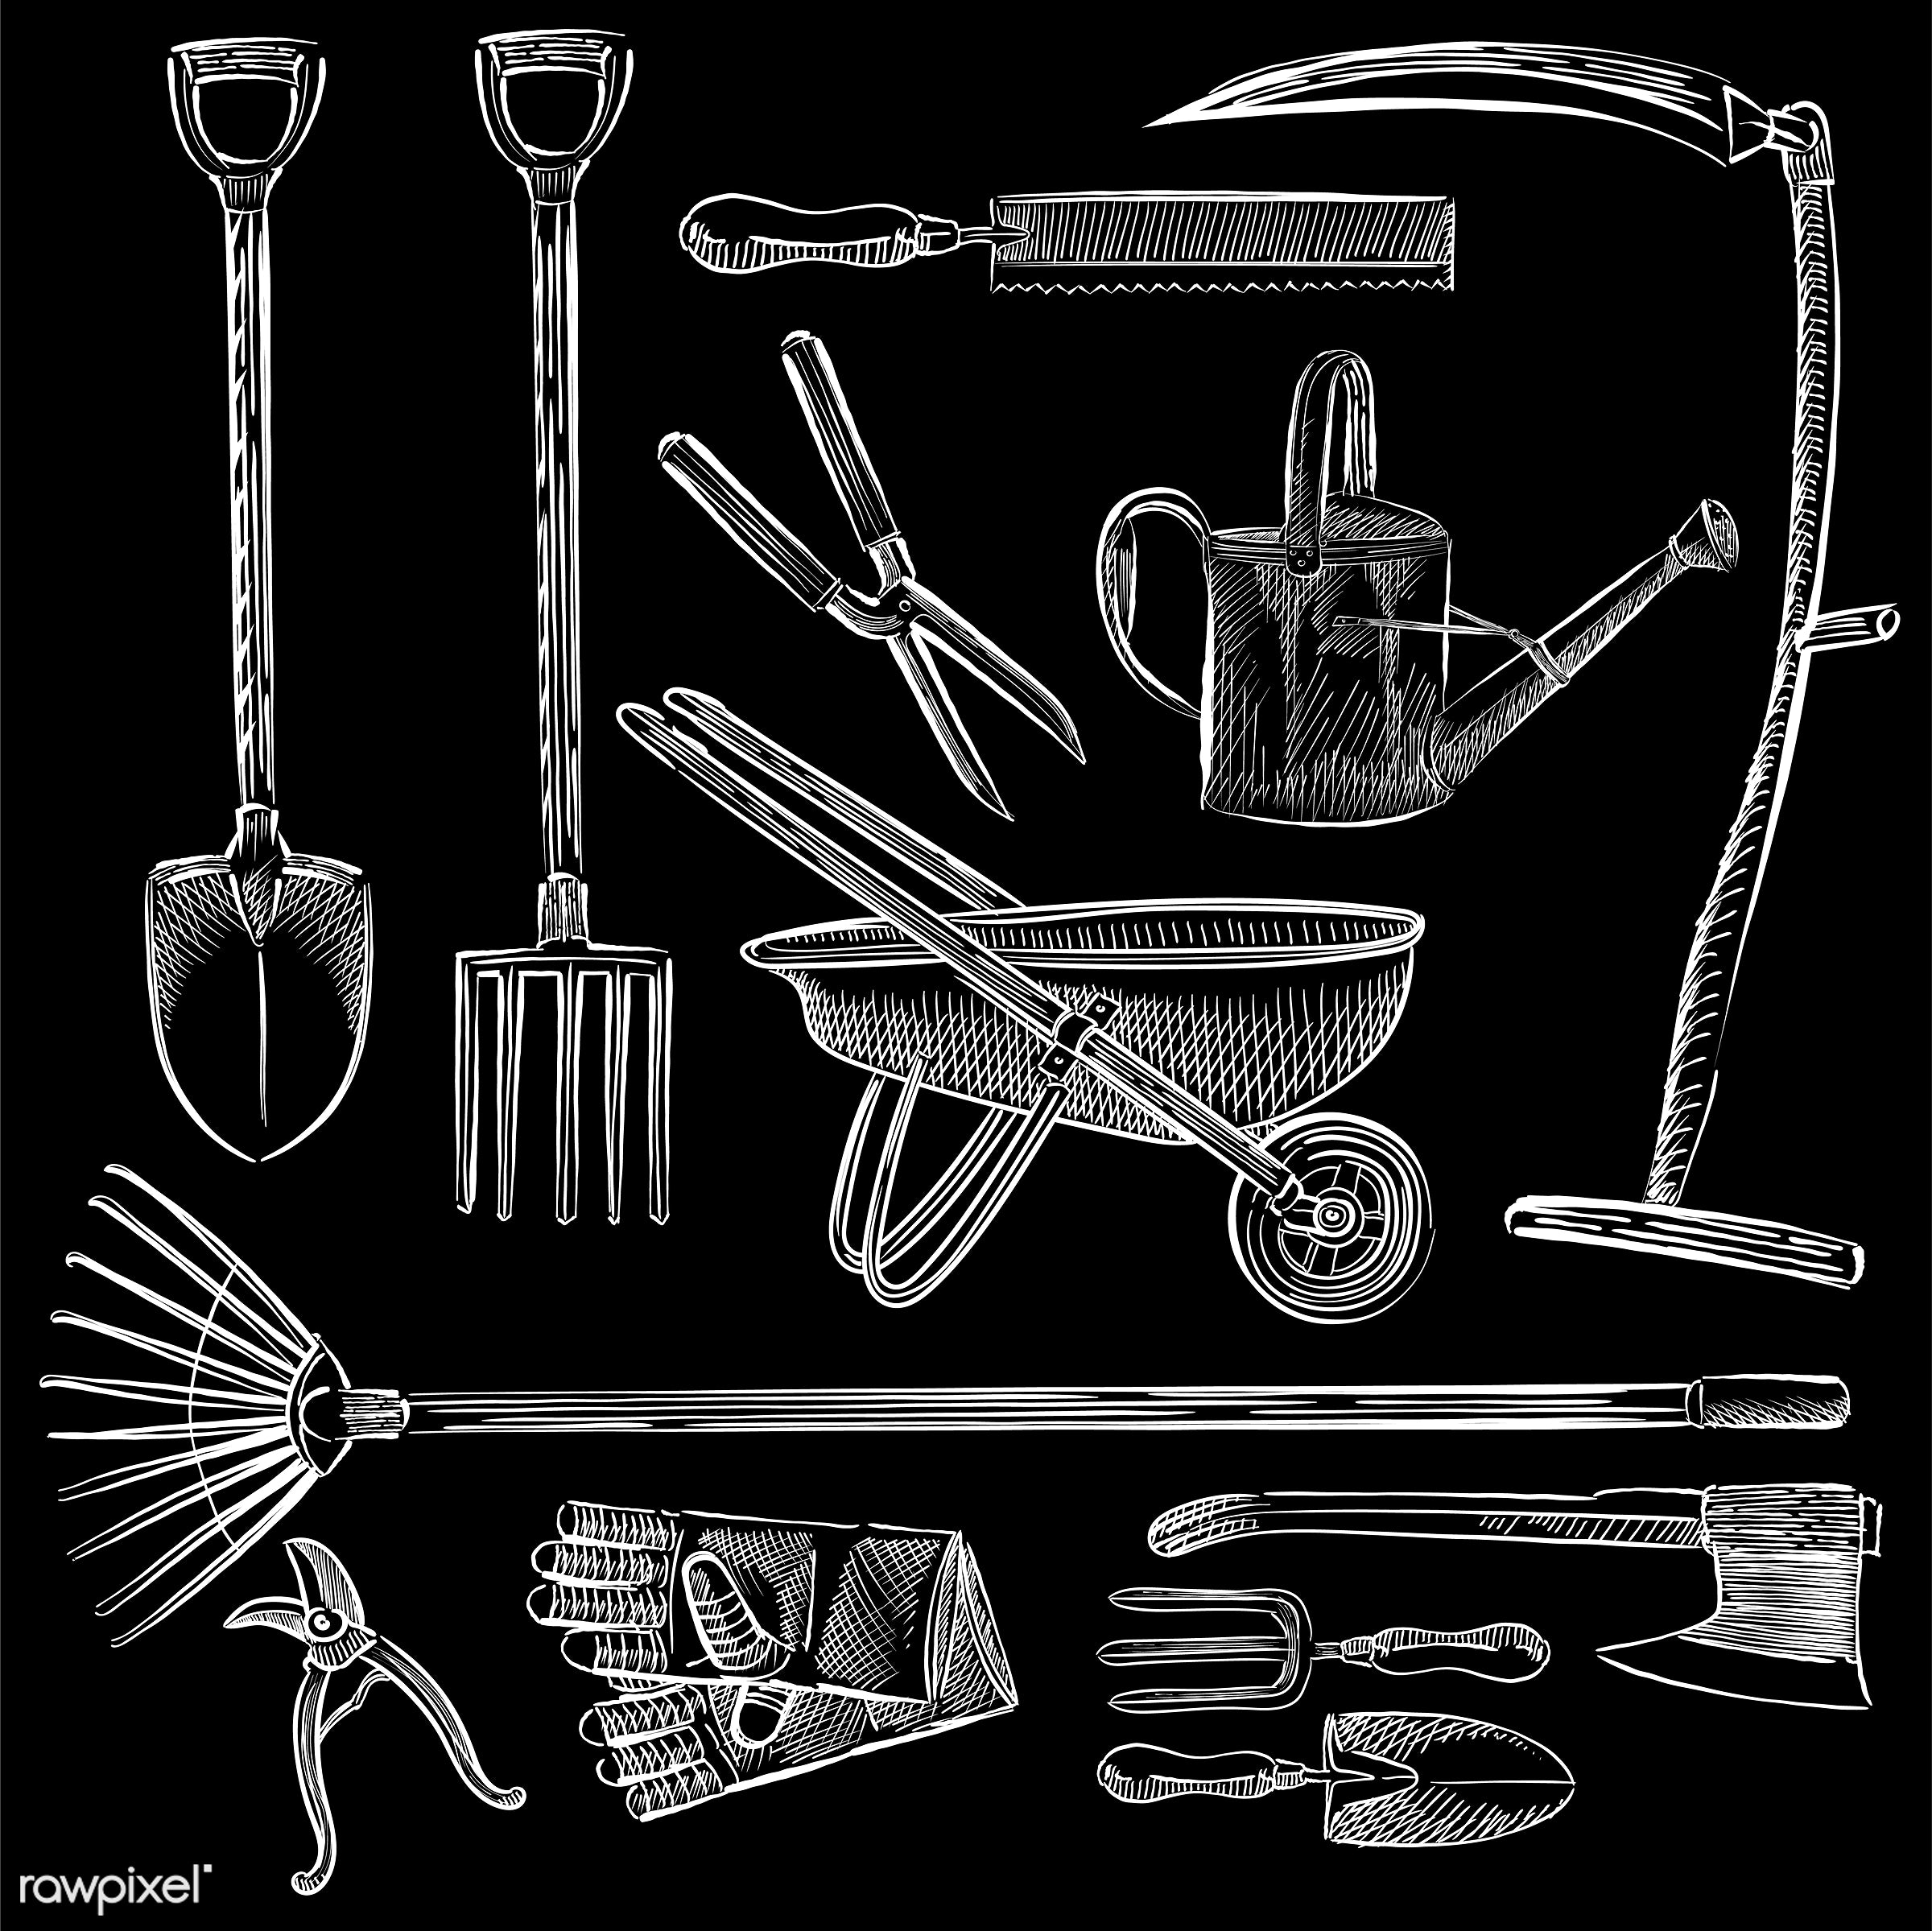 Illustration of a set of gardening tools - antique, axe, black, collection, design, drawing, equipment, fork, garden, garden...